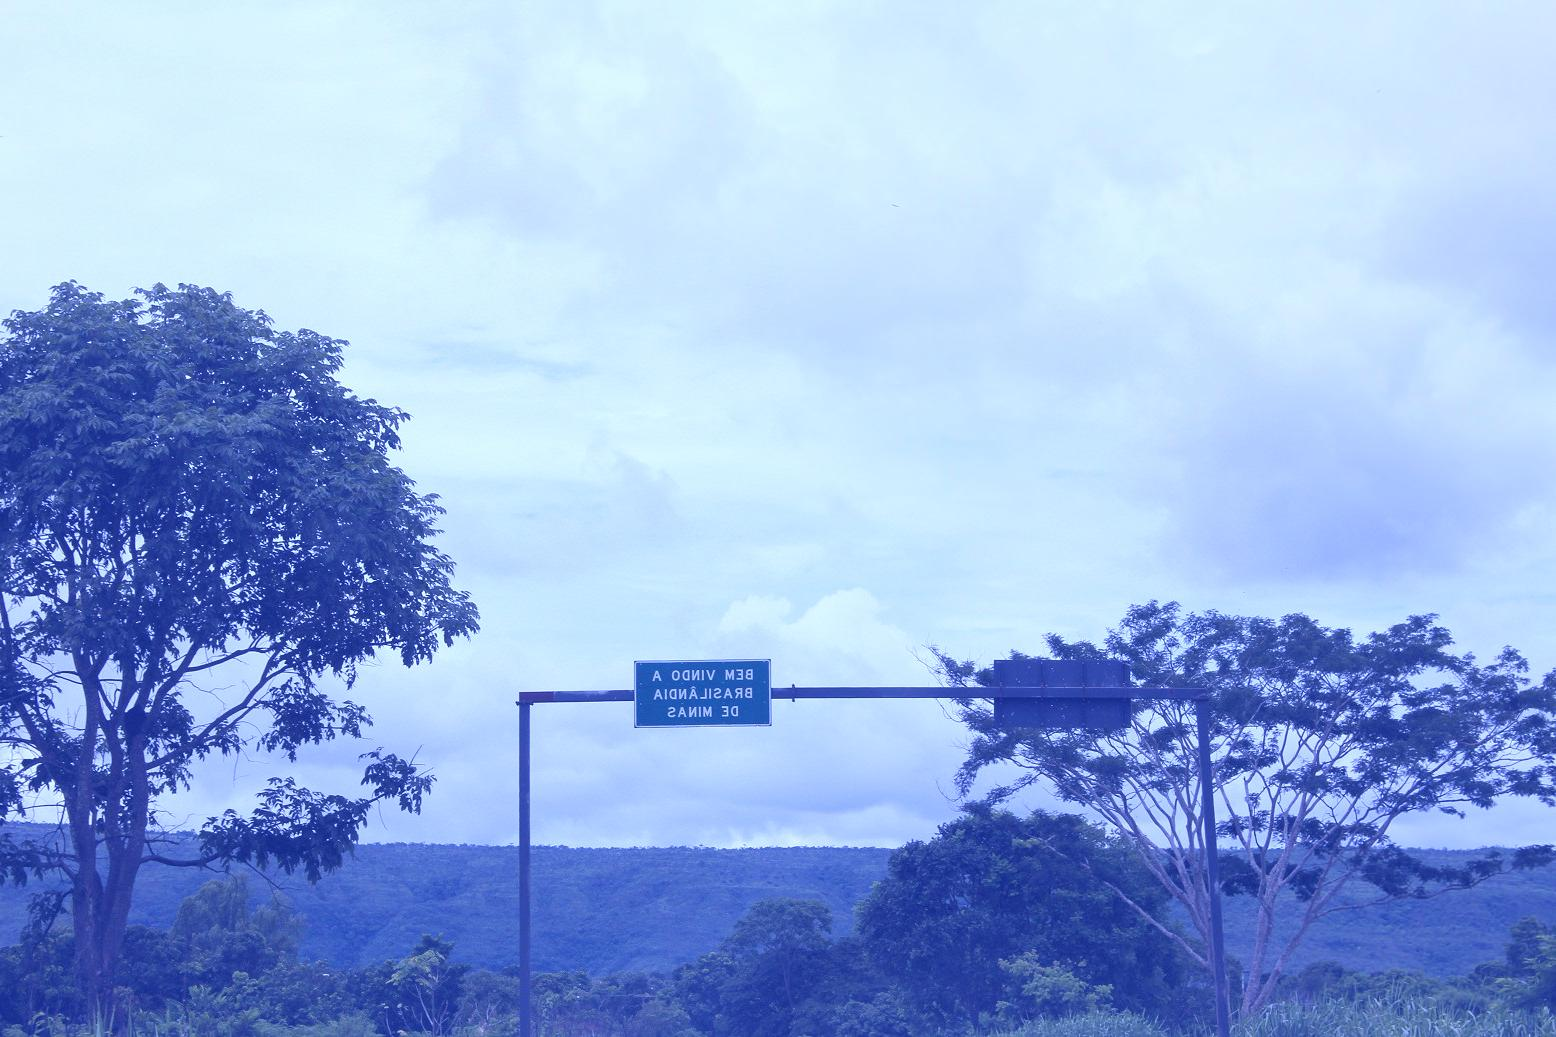 Mei Microempreendedor em Brasilândia de Minas, MG